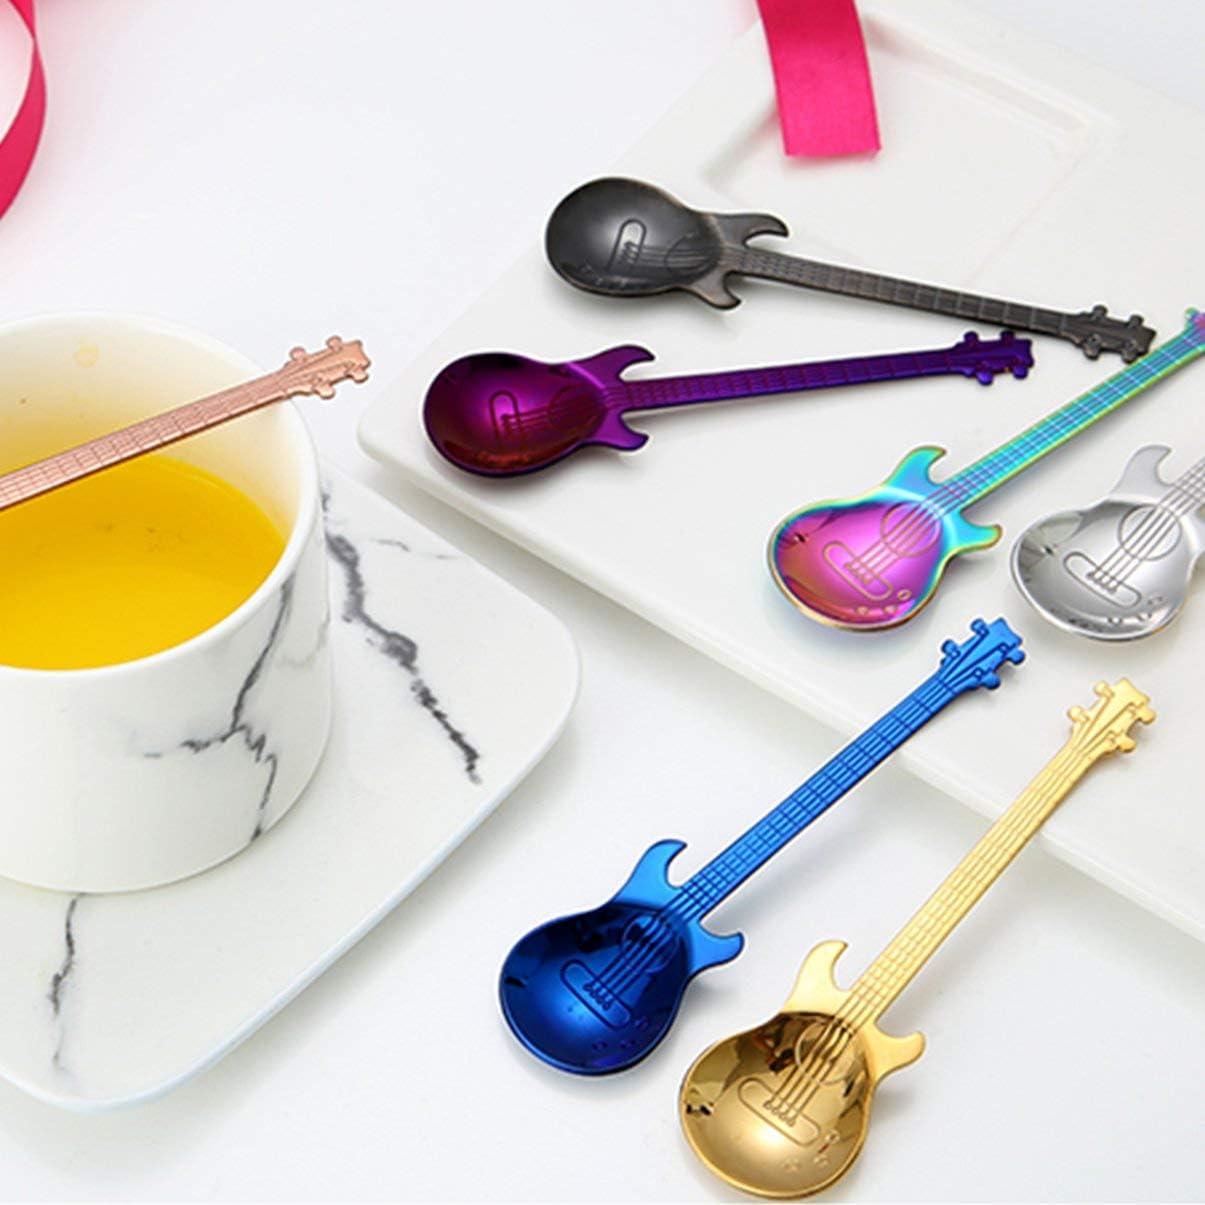 FHJZXDGHNXFGH Guitar Coffee Spoon Set Stainless Steel Dessert Ice Cream Spoon Tea Spoon Coffee Accessories Flatware Drinking Tools